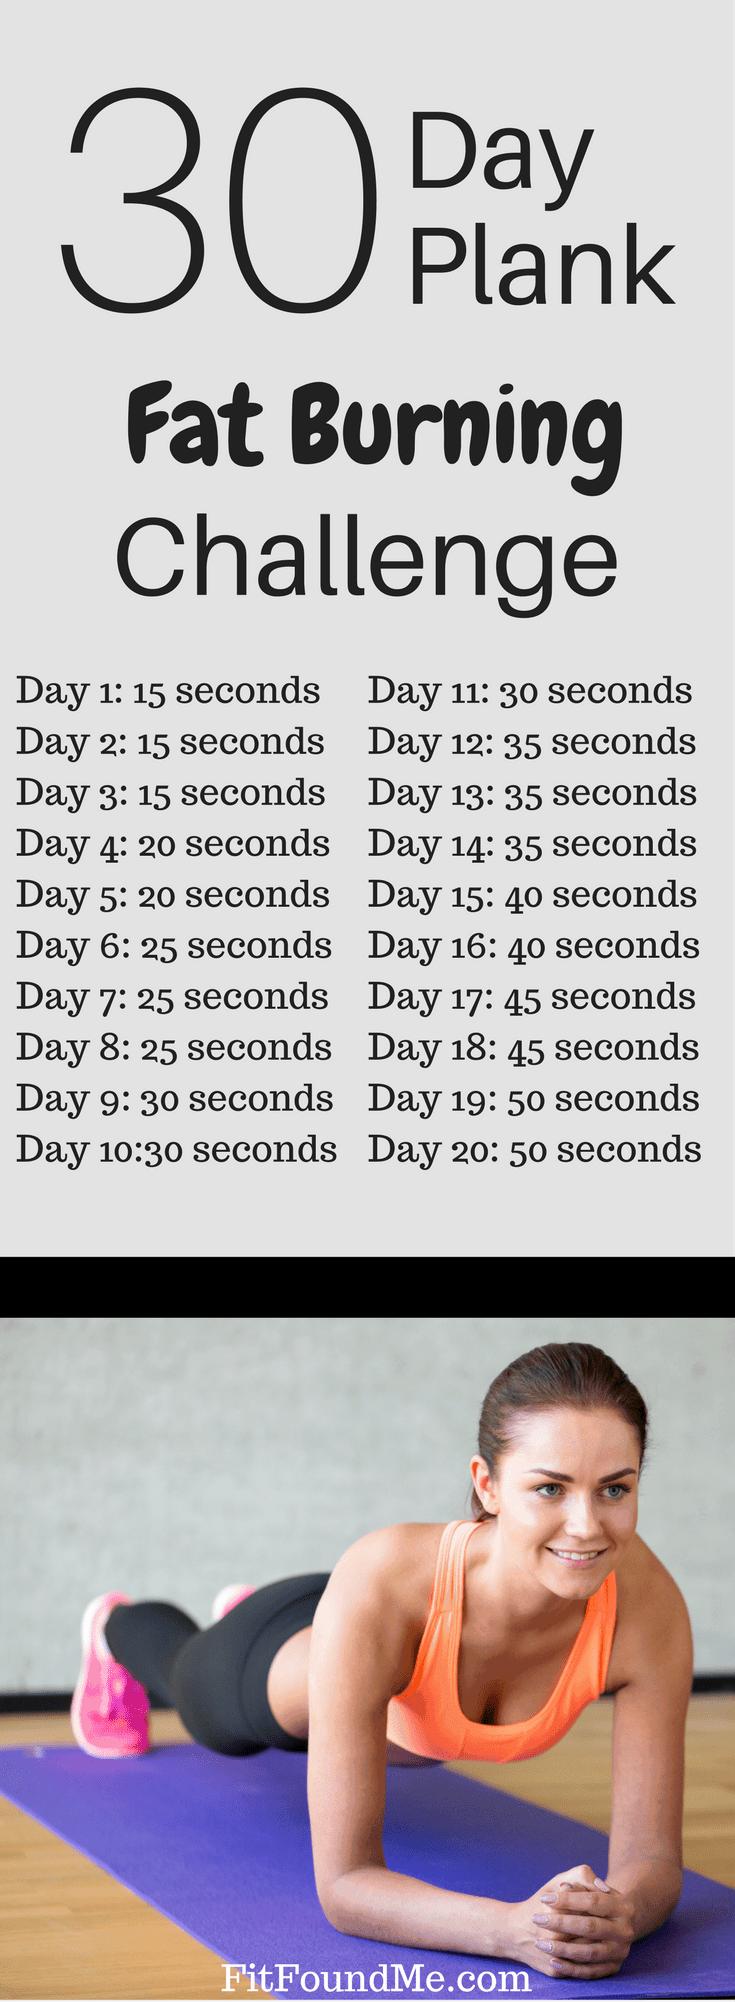 30 day plank fat burning challenge